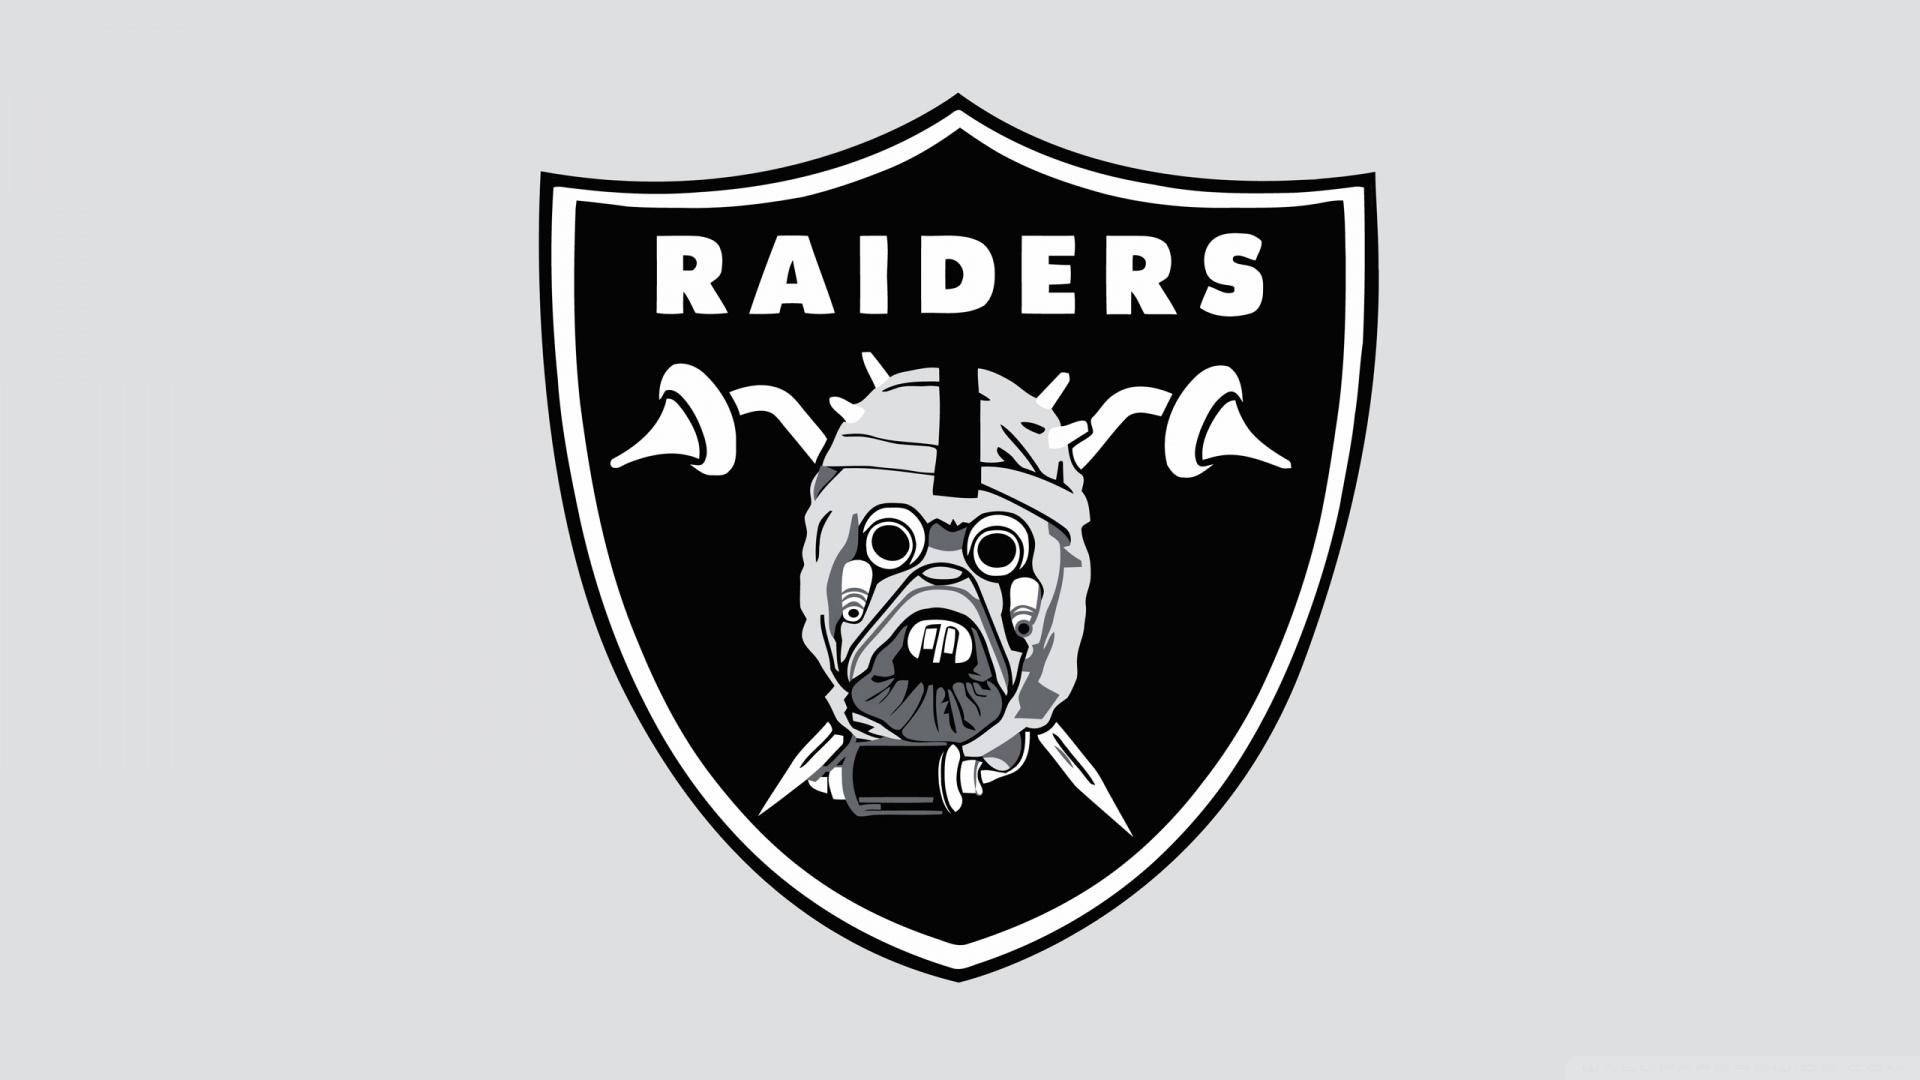 Oakland Raiders 3d Wallpaper Star Wars Raiders 4k Hd Desktop Wallpaper For 4k Ultra Hd